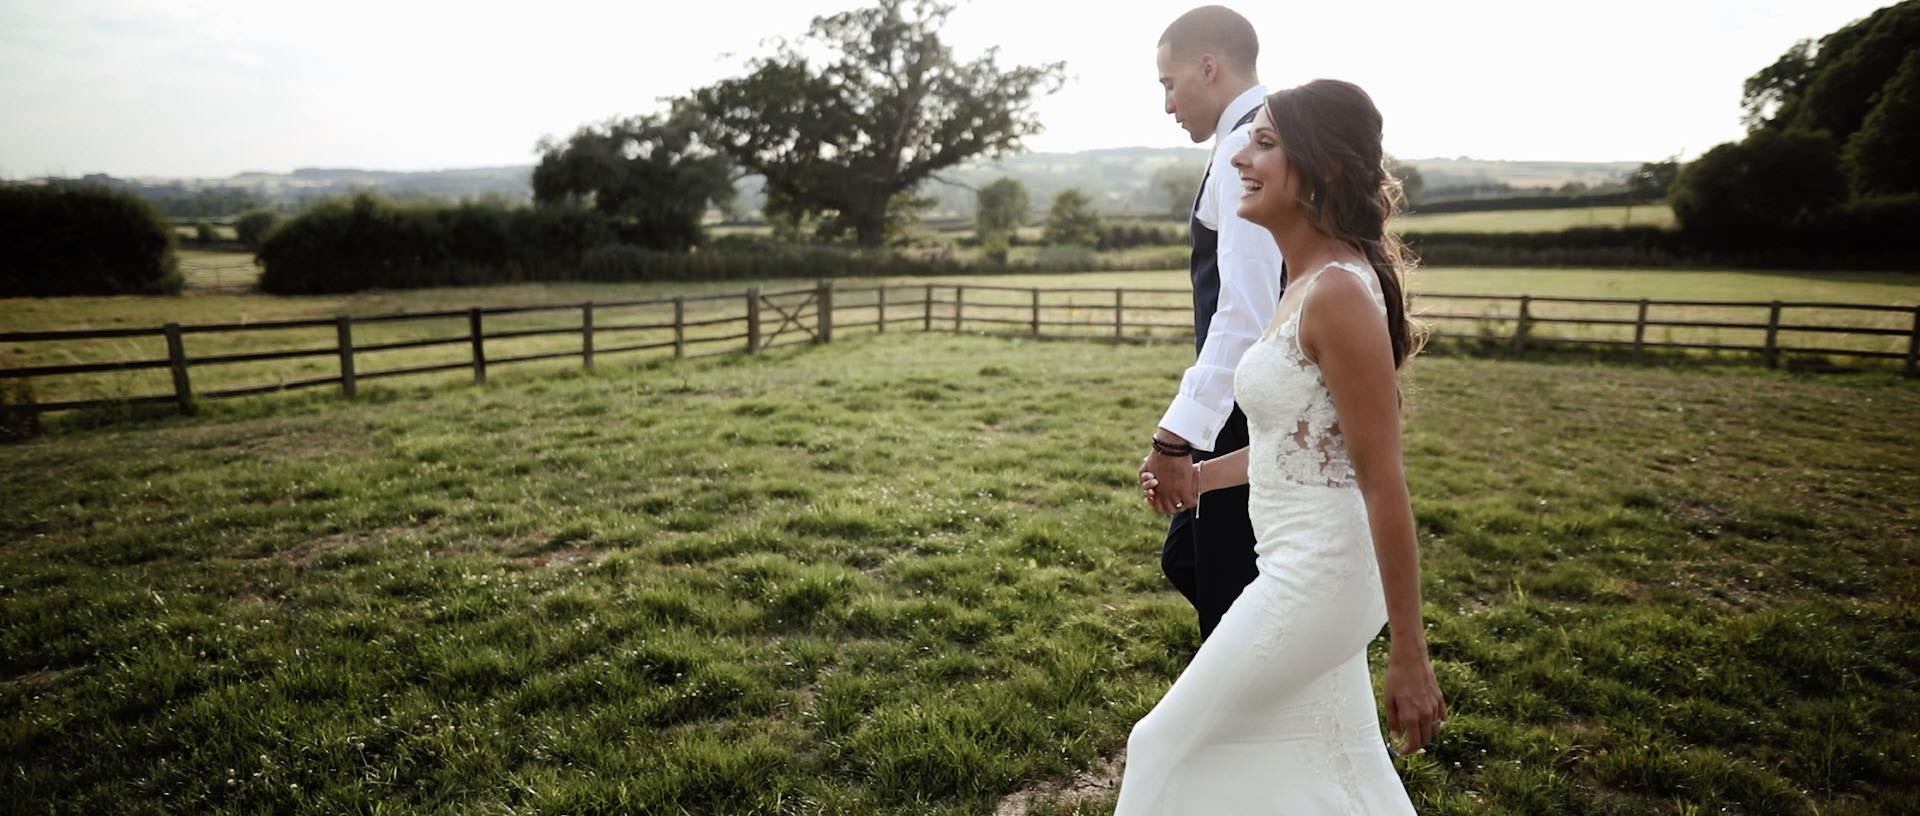 Hyde Barn Colswolds Wedding Verity-Jade & Kai 5 Cropped.jpg